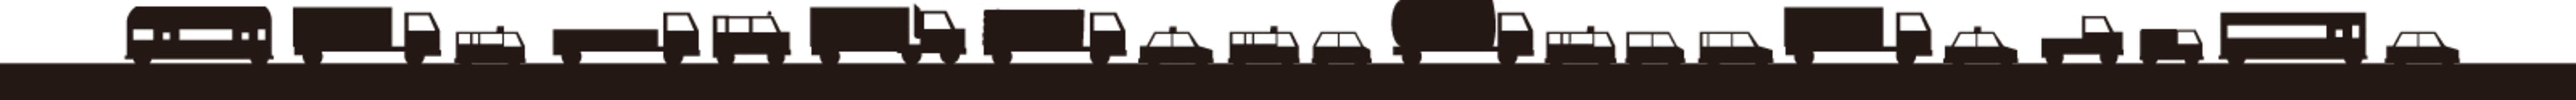 Cityscape Shadow series car